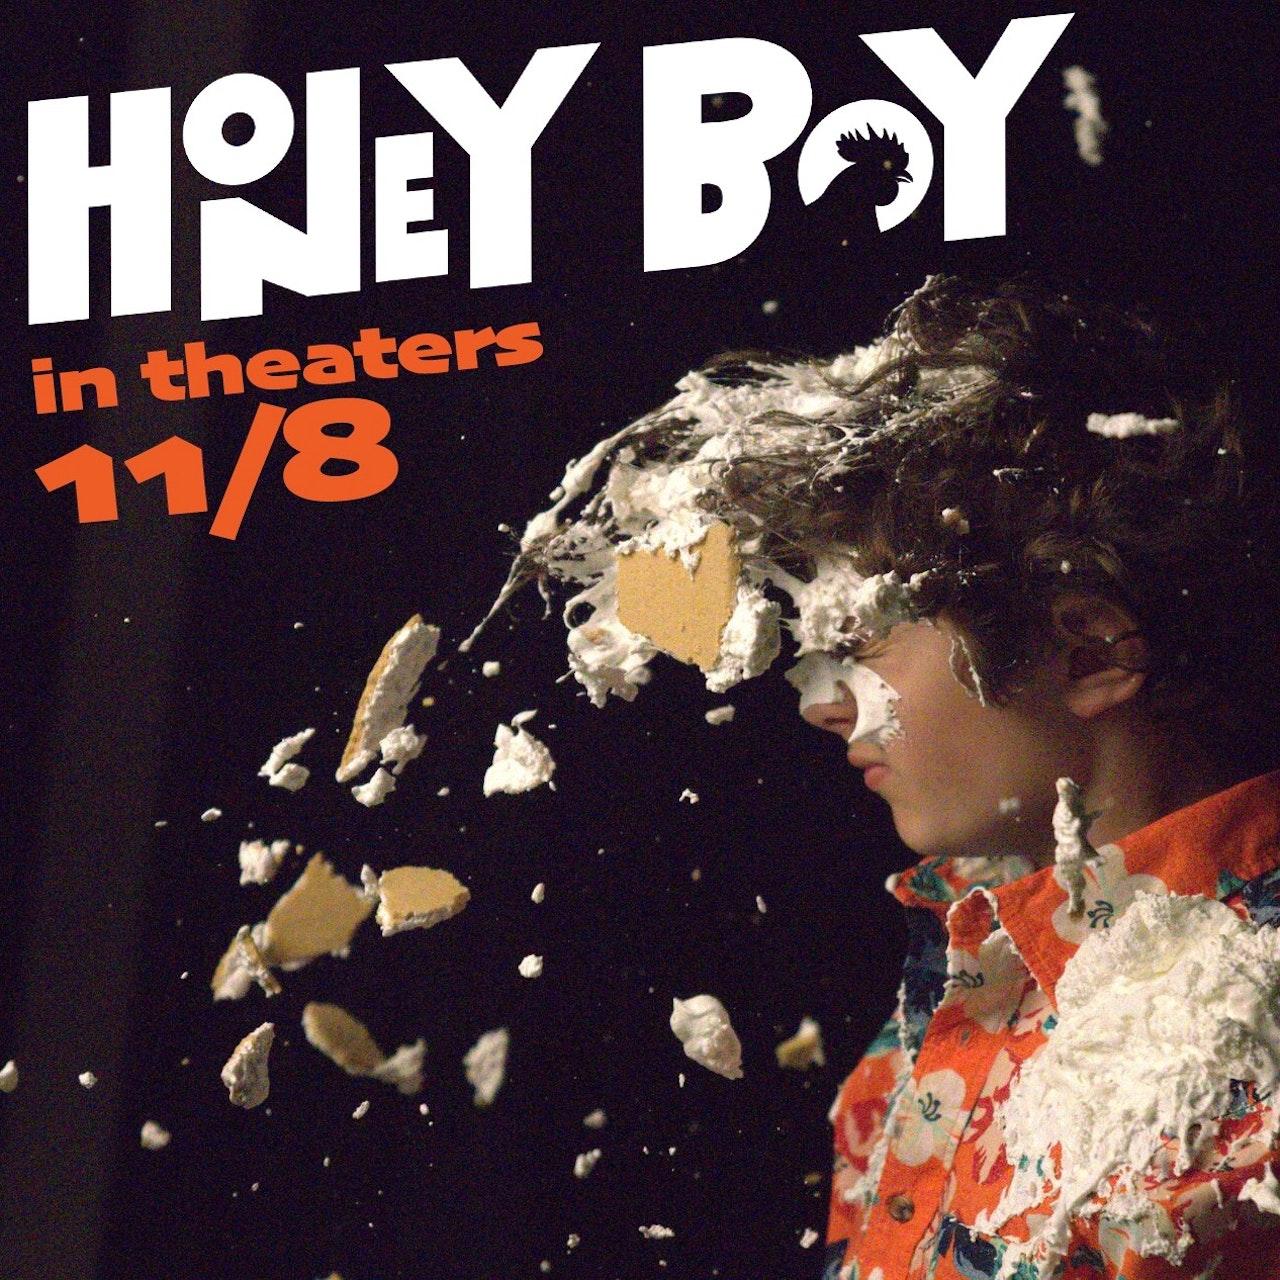 """Honey Boy"" in theatres on November 8th."